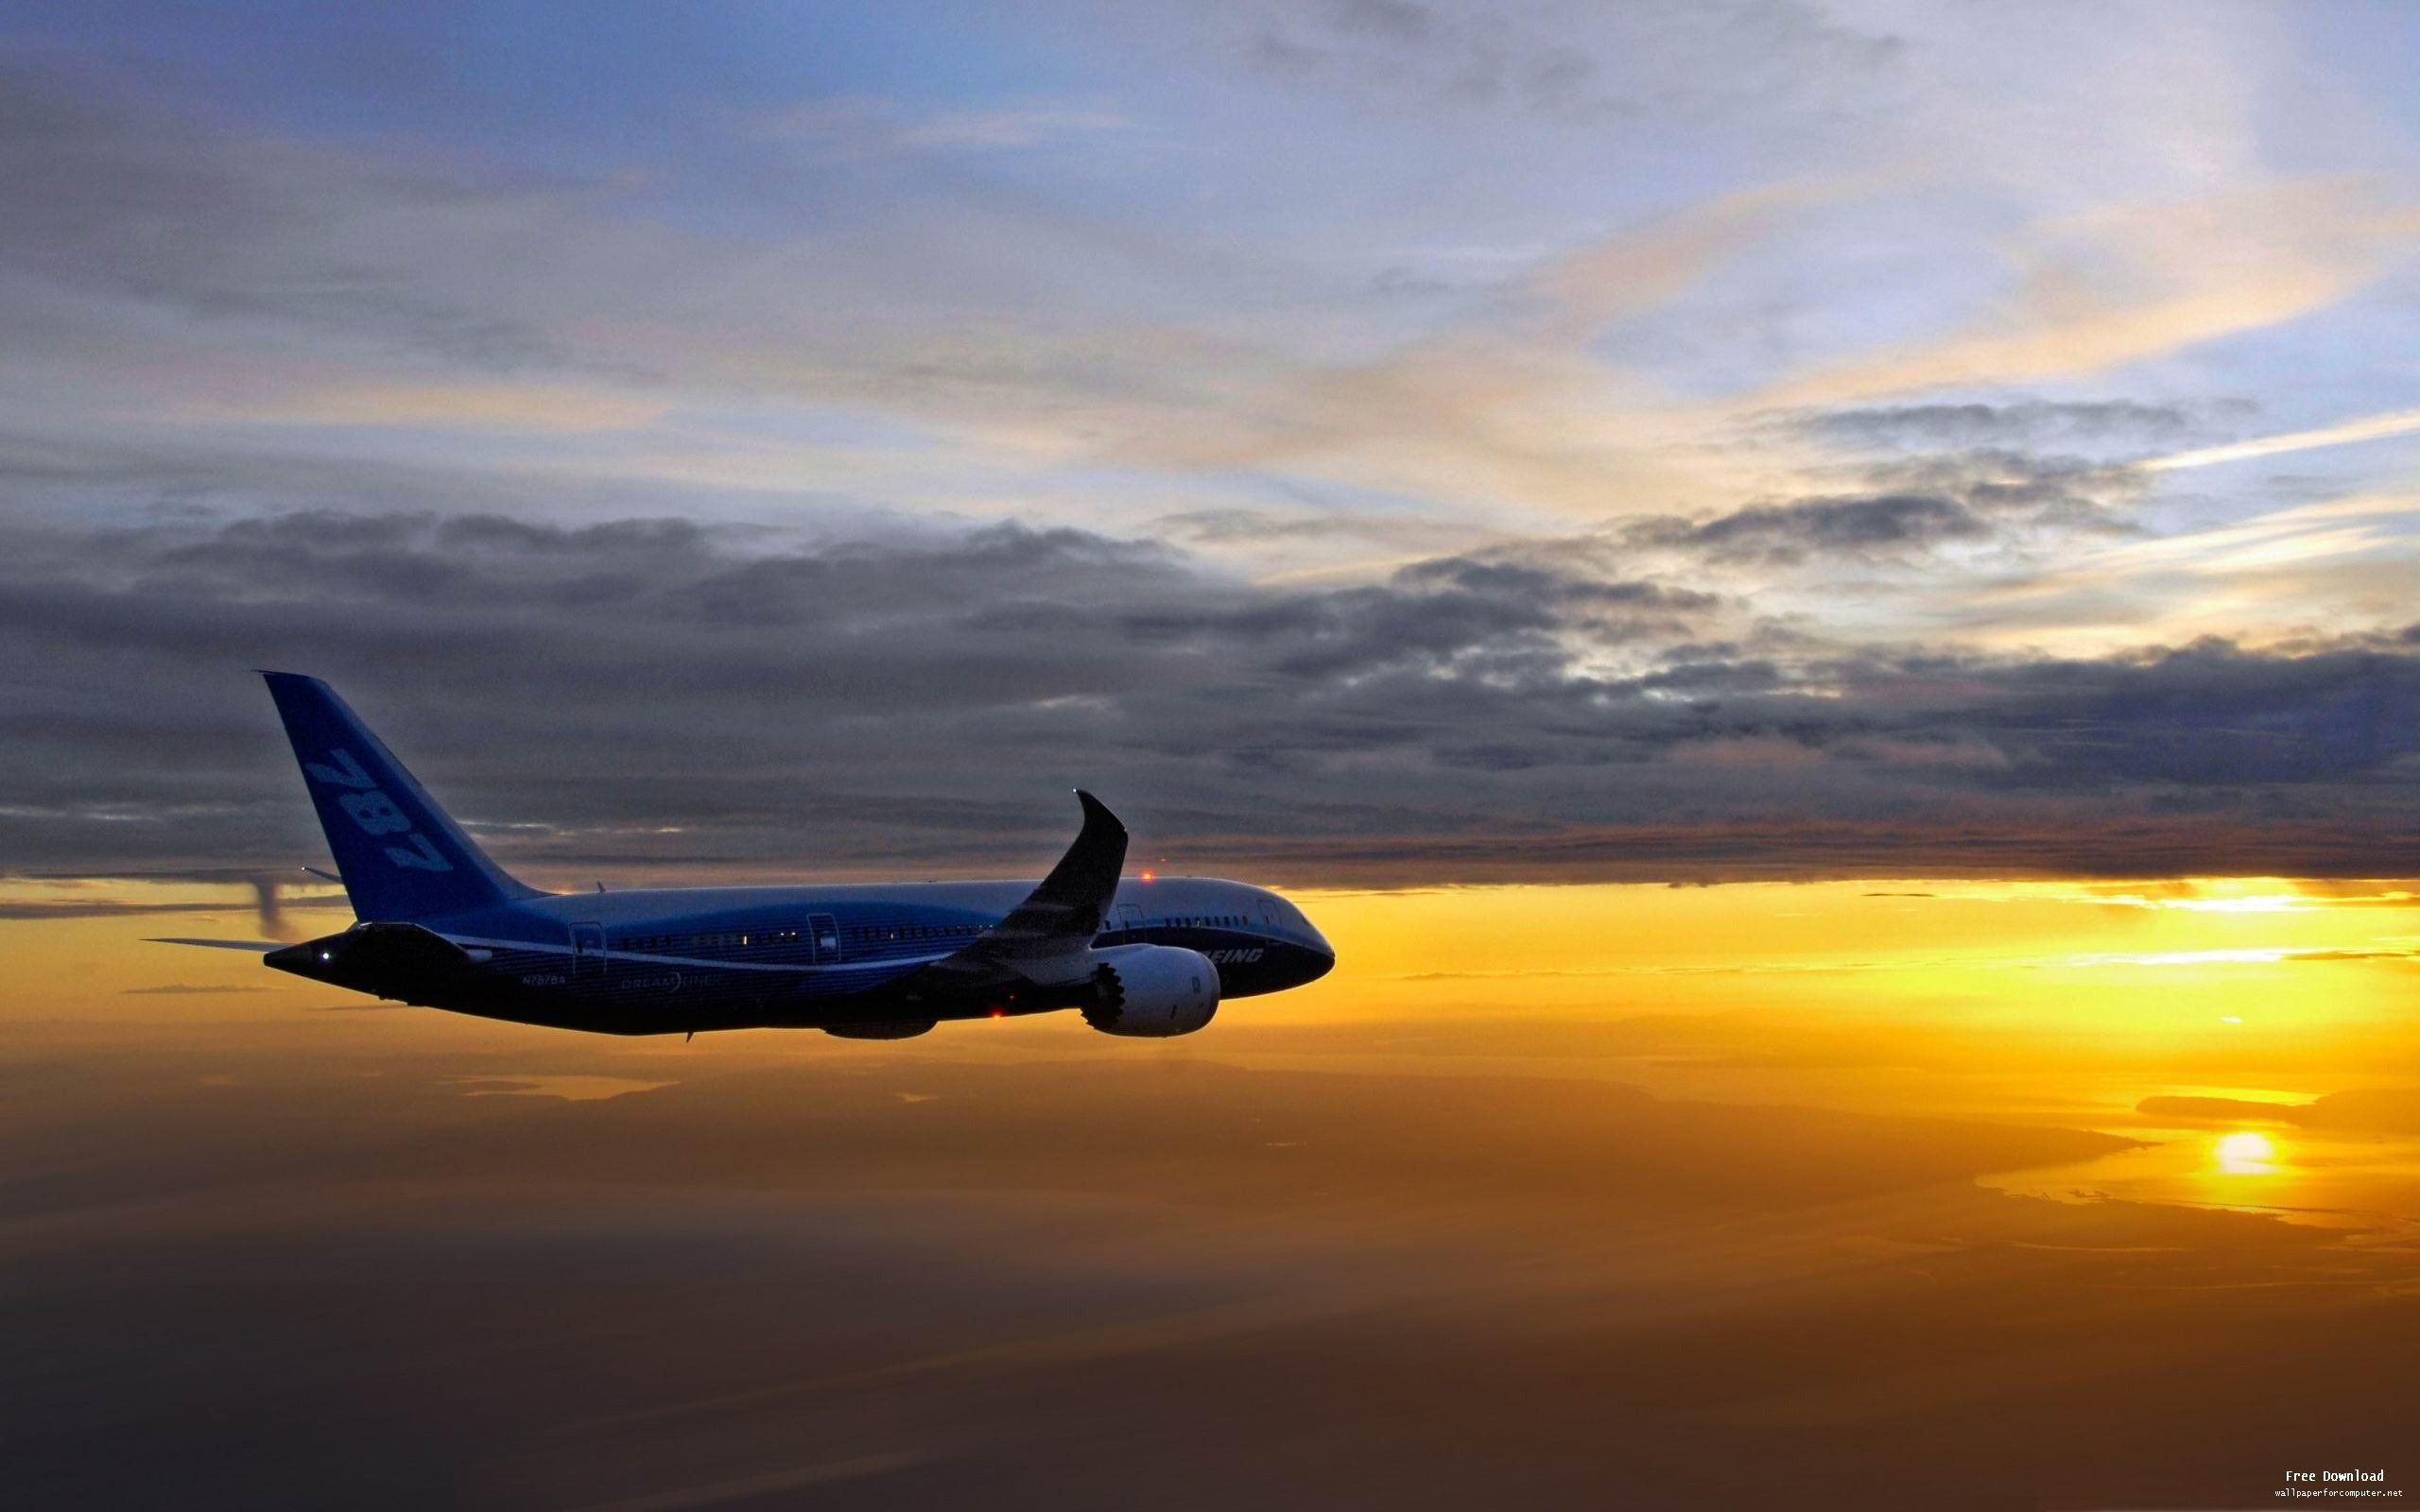 beautiful aircraft wallpaper view - photo #2